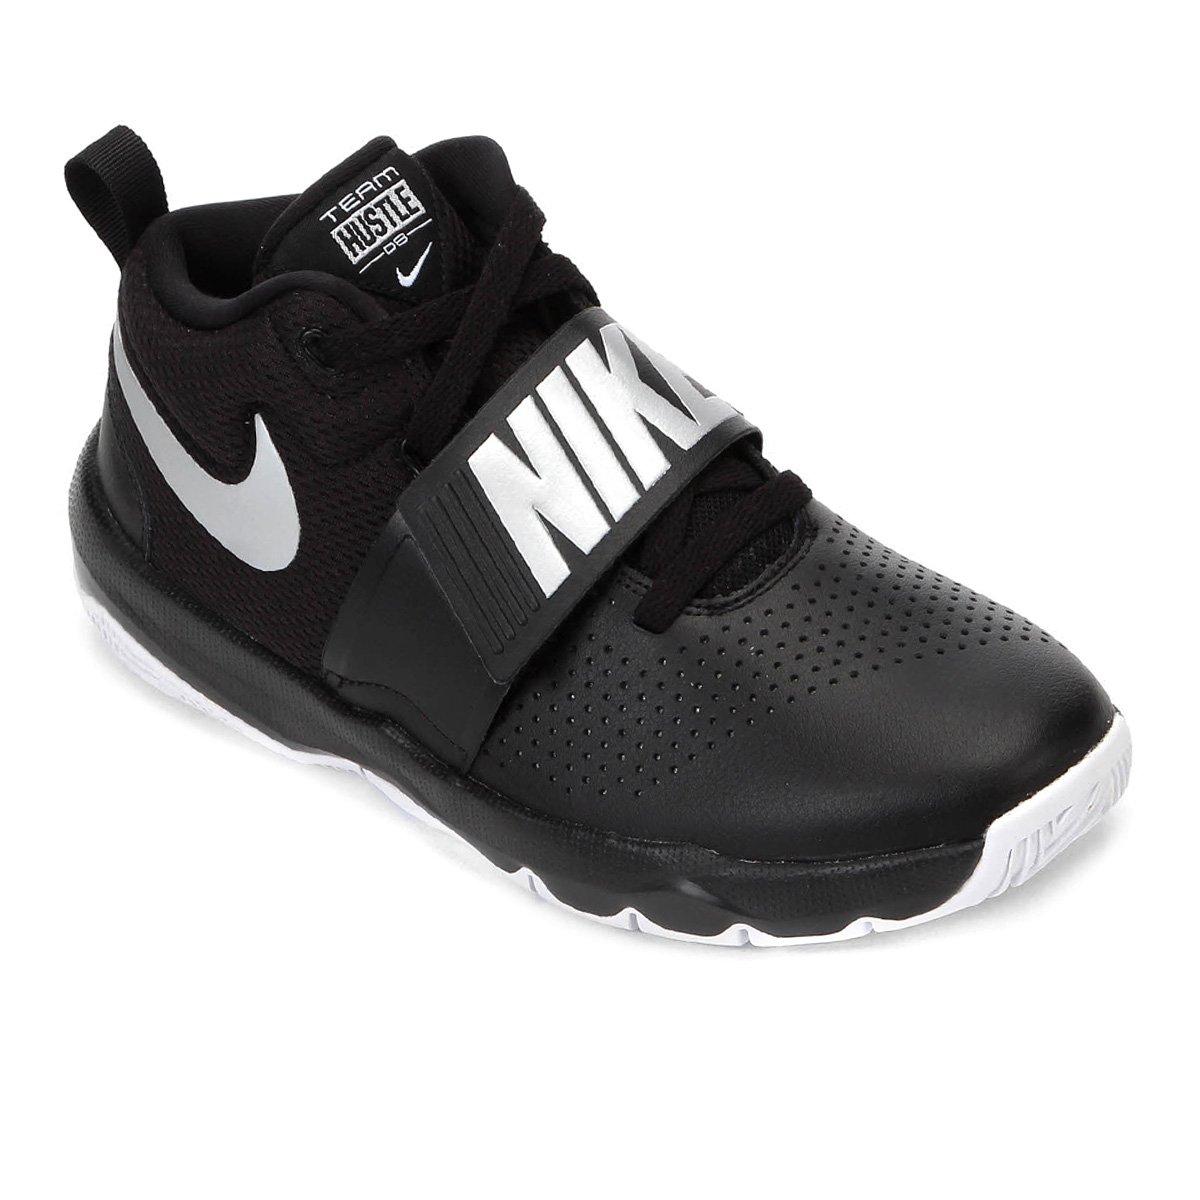 ee631c43823 Tênis Infantil Nike Team Hustle D 8 Masculino - Preto e Prata ...